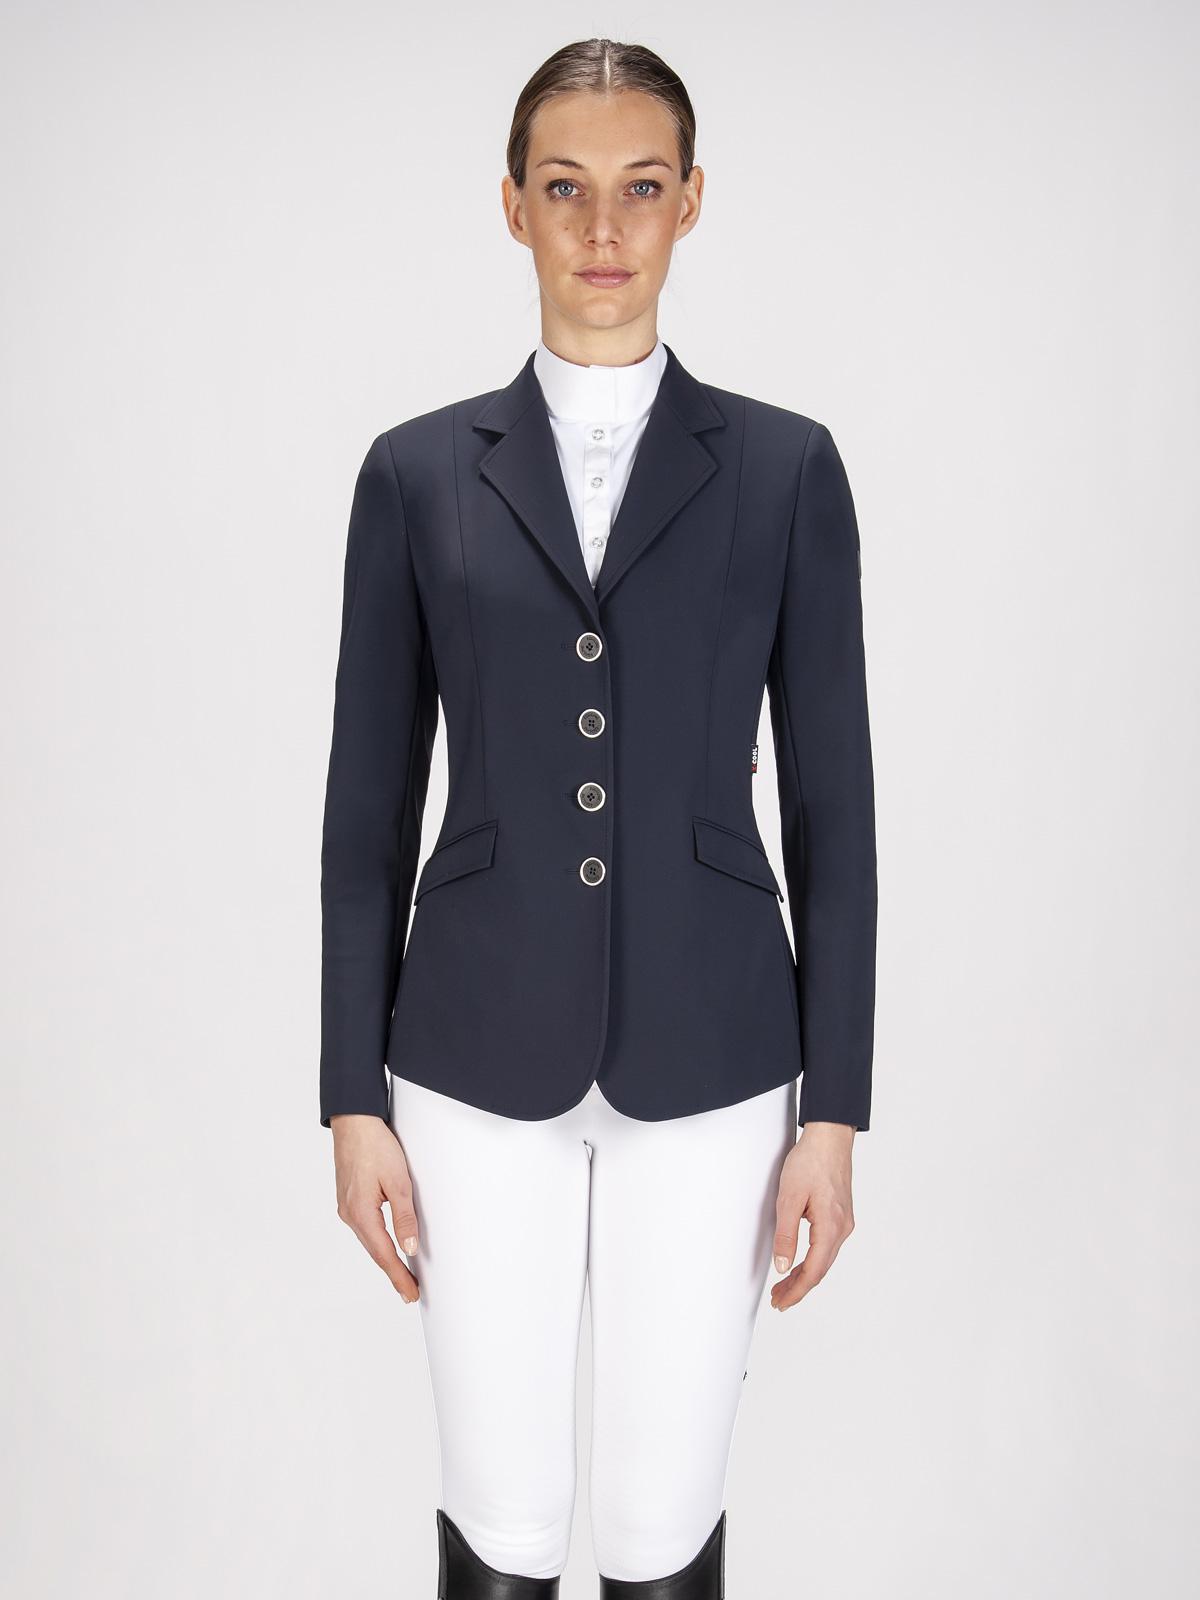 Gait women's show coat in X-Cool Evo performance fabric navy blue